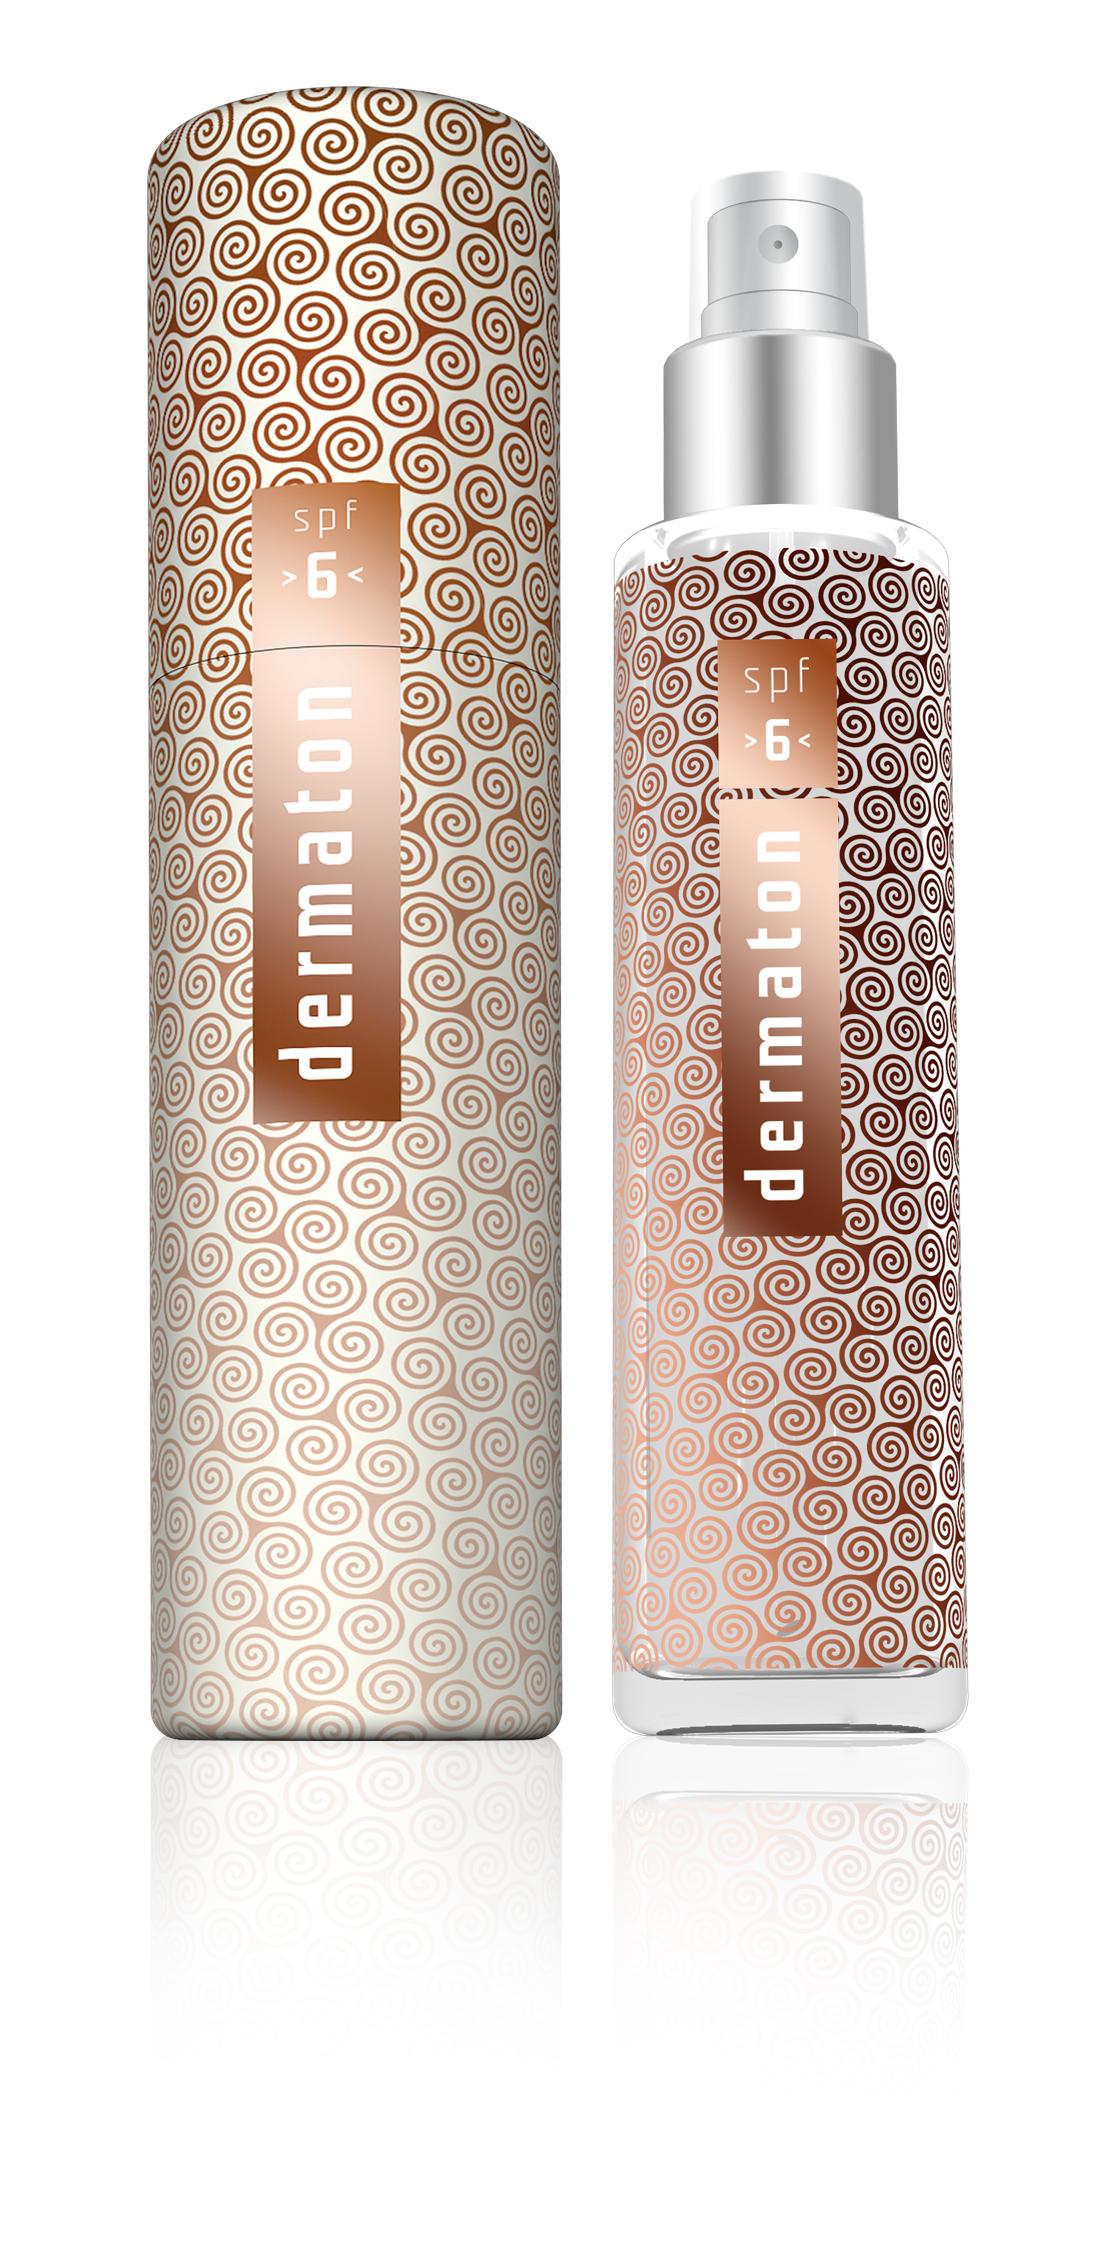 Energy Dermaton spf6, 100 ml